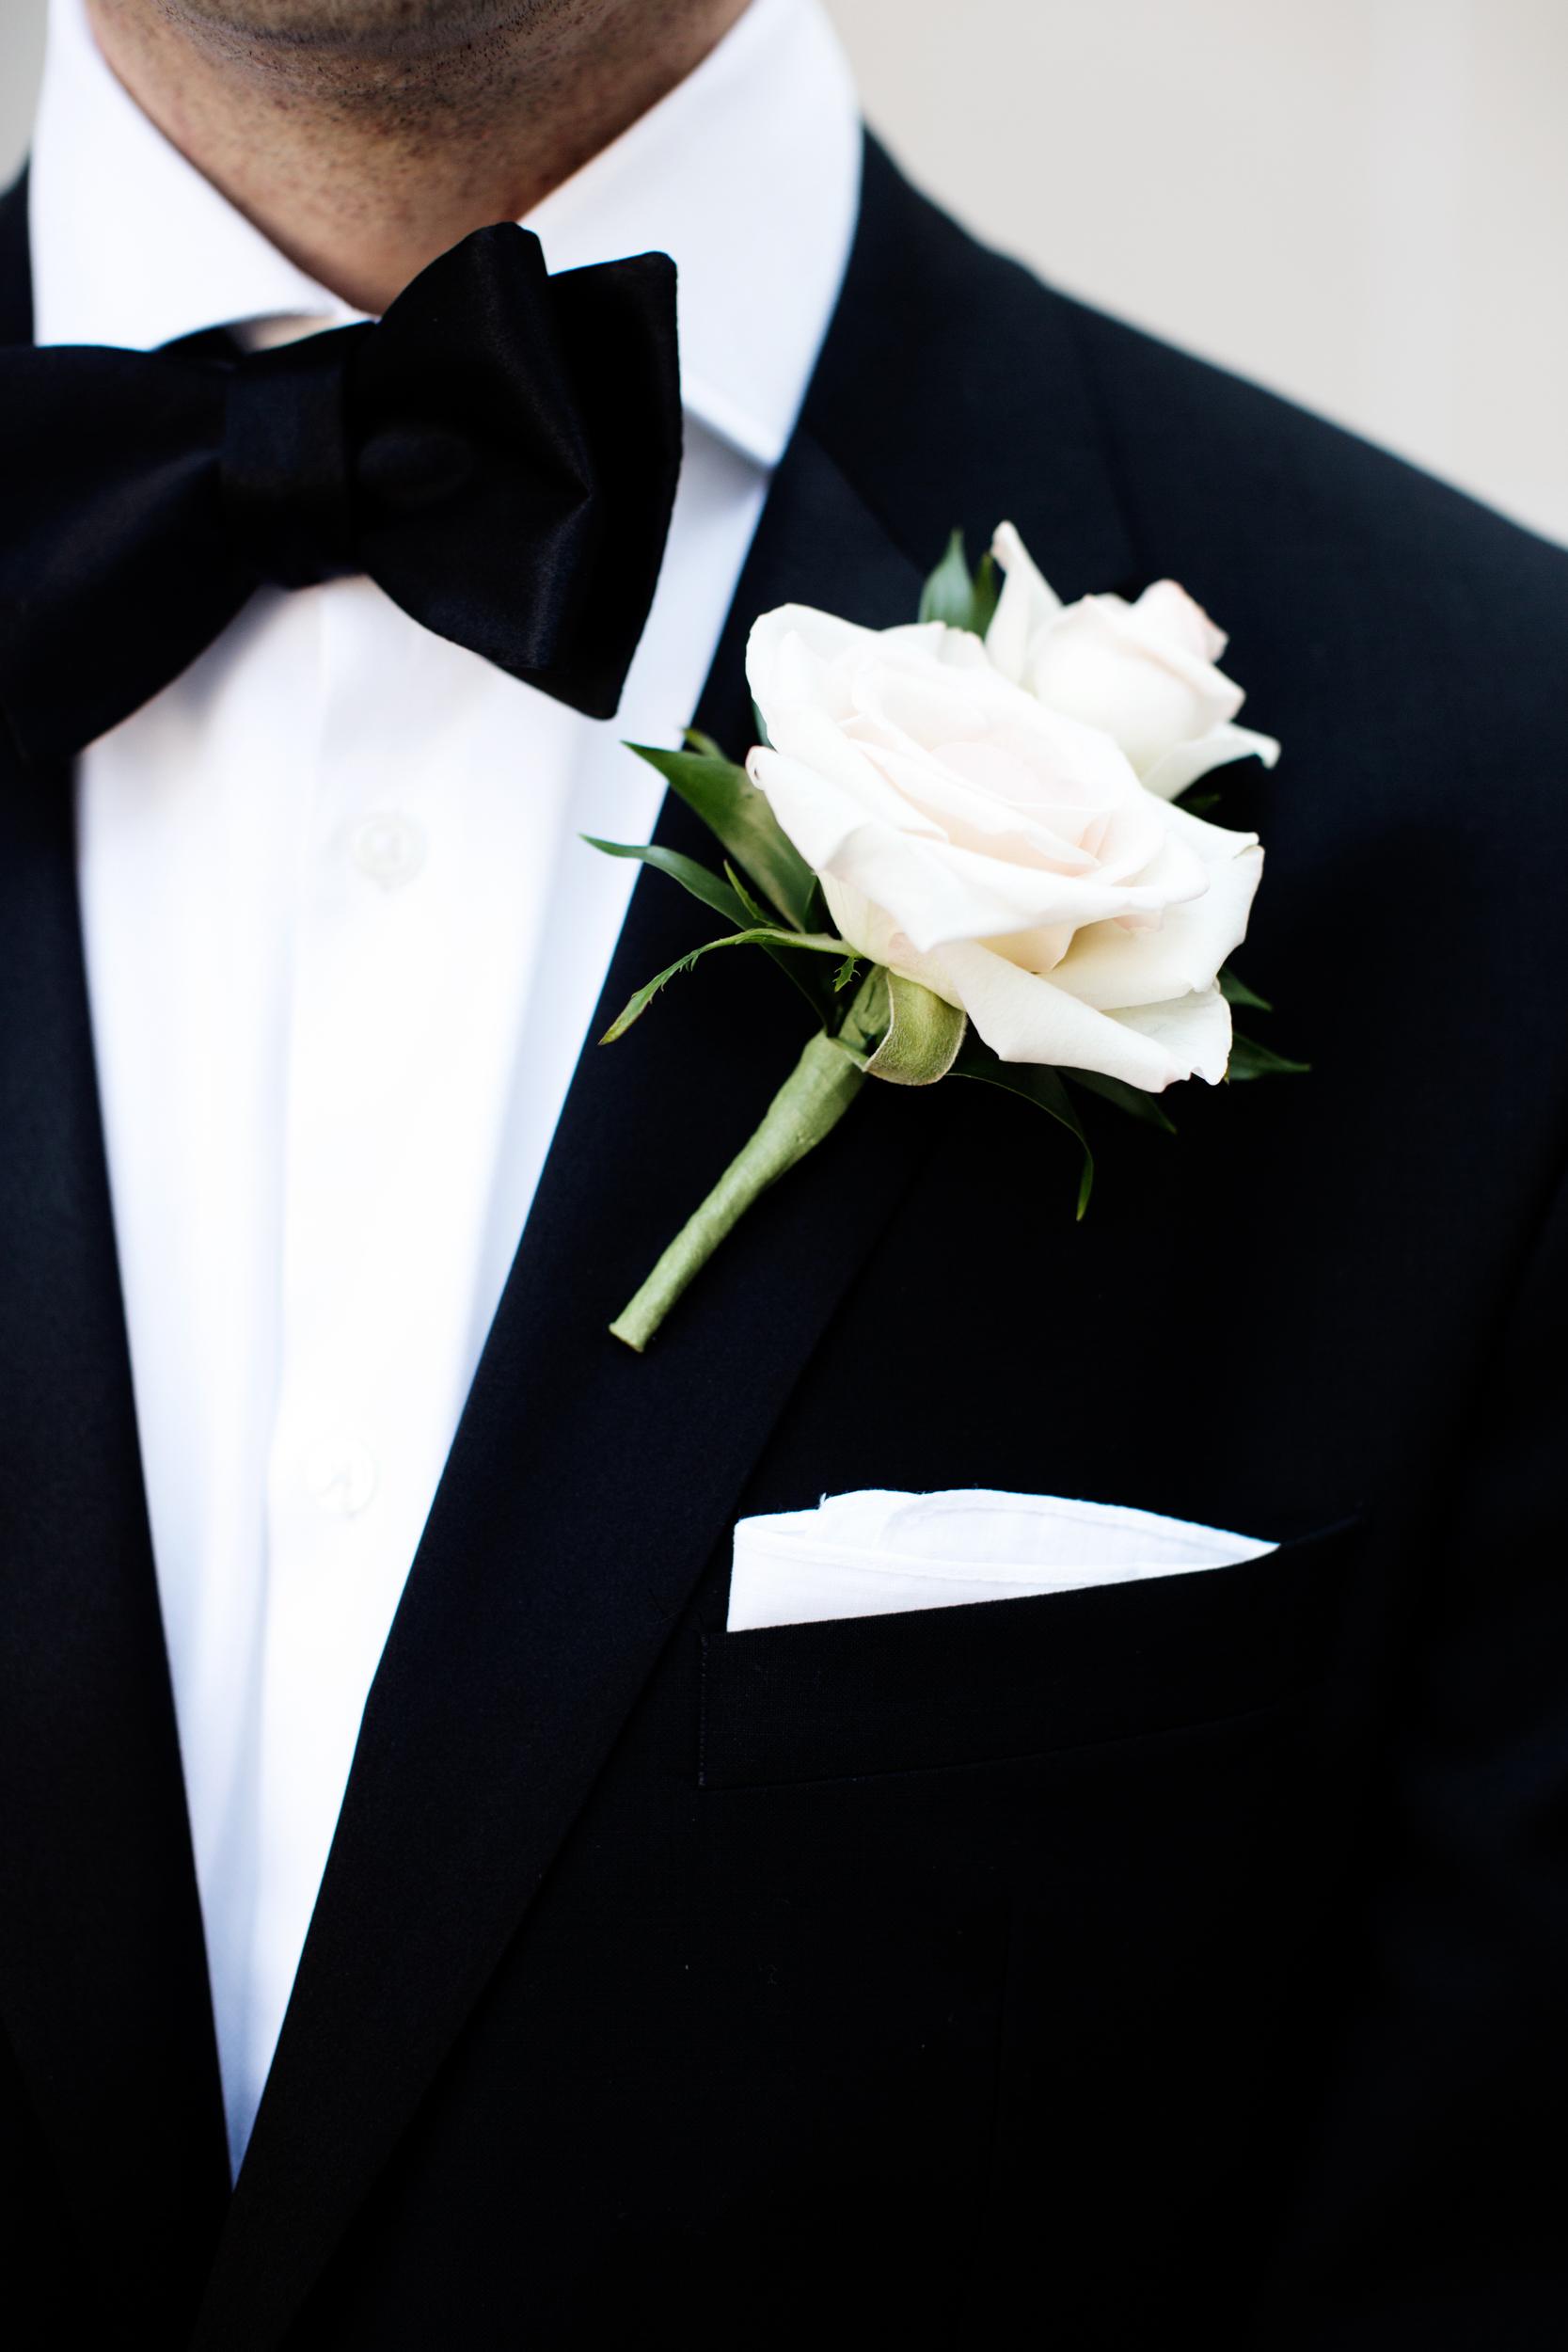 Ceci_New_York_Ceci_Style_Ceci_Johnson_Luxury_Lifestyle_Floral_Lace_Wedding_Letterpress_Inspiration_Design_Custom_Couture_Personalized_Invitations_-102.jpg